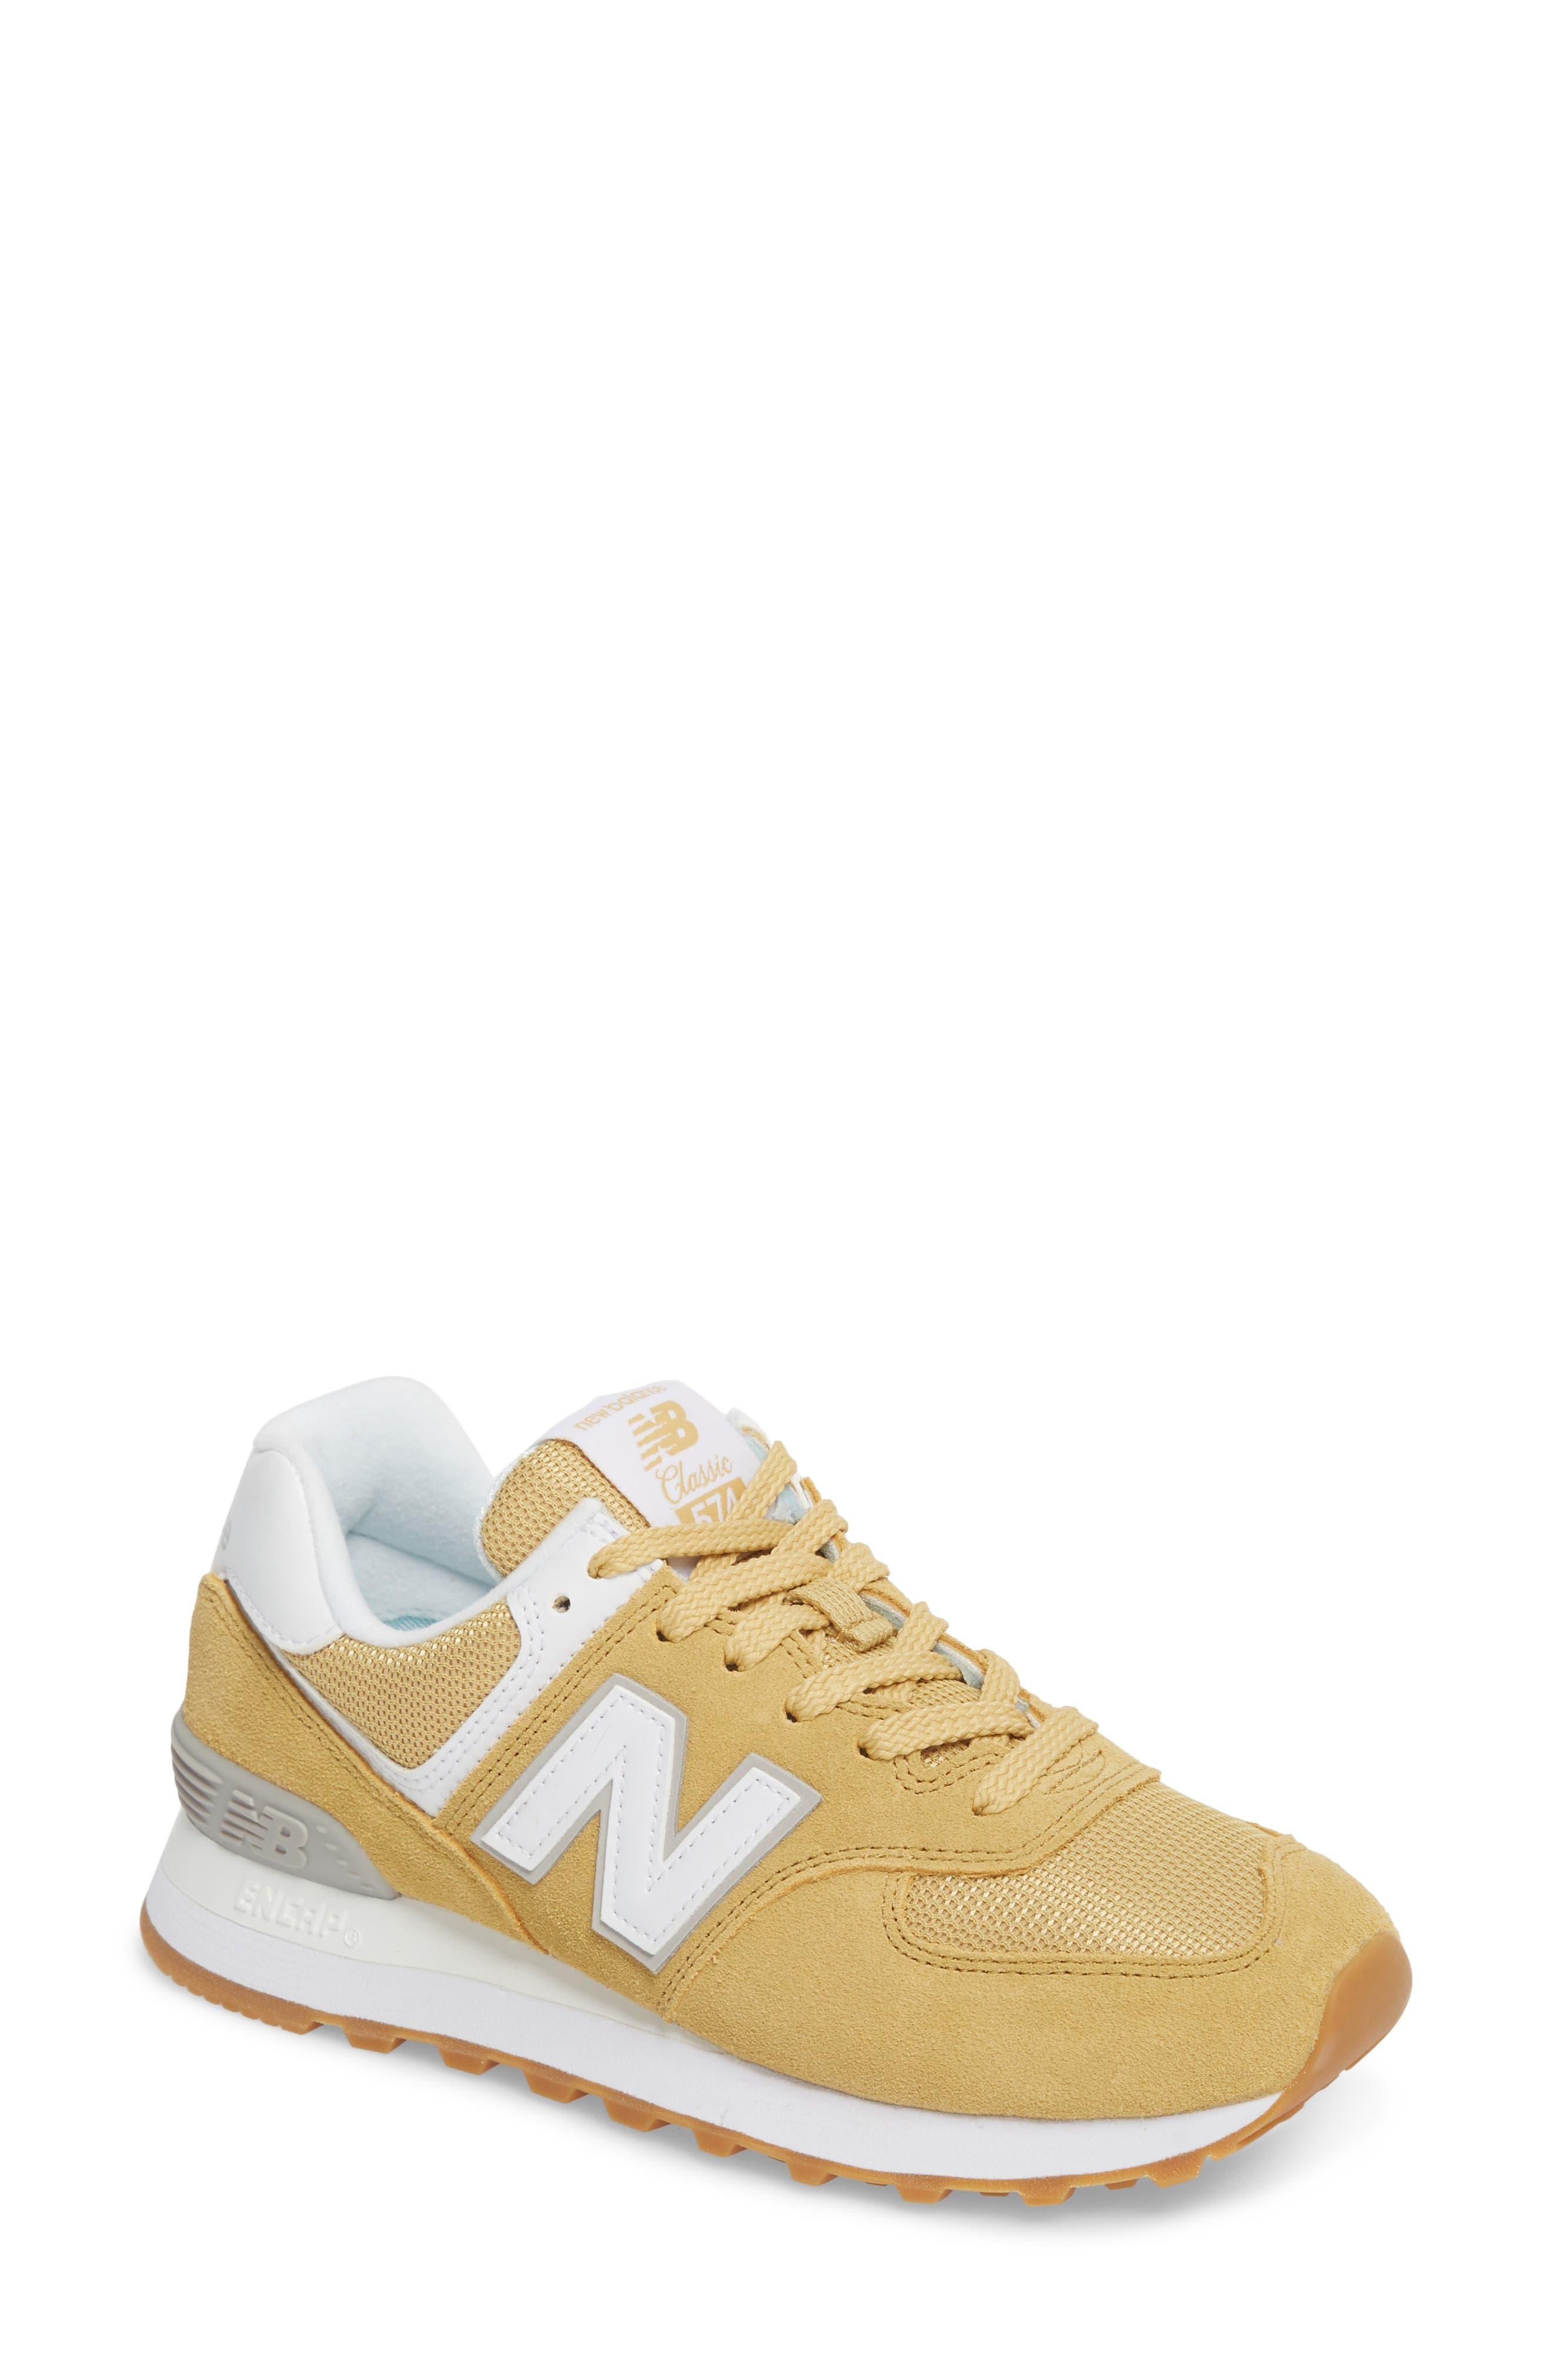 574 Sneaker,                             Main thumbnail 6, color,